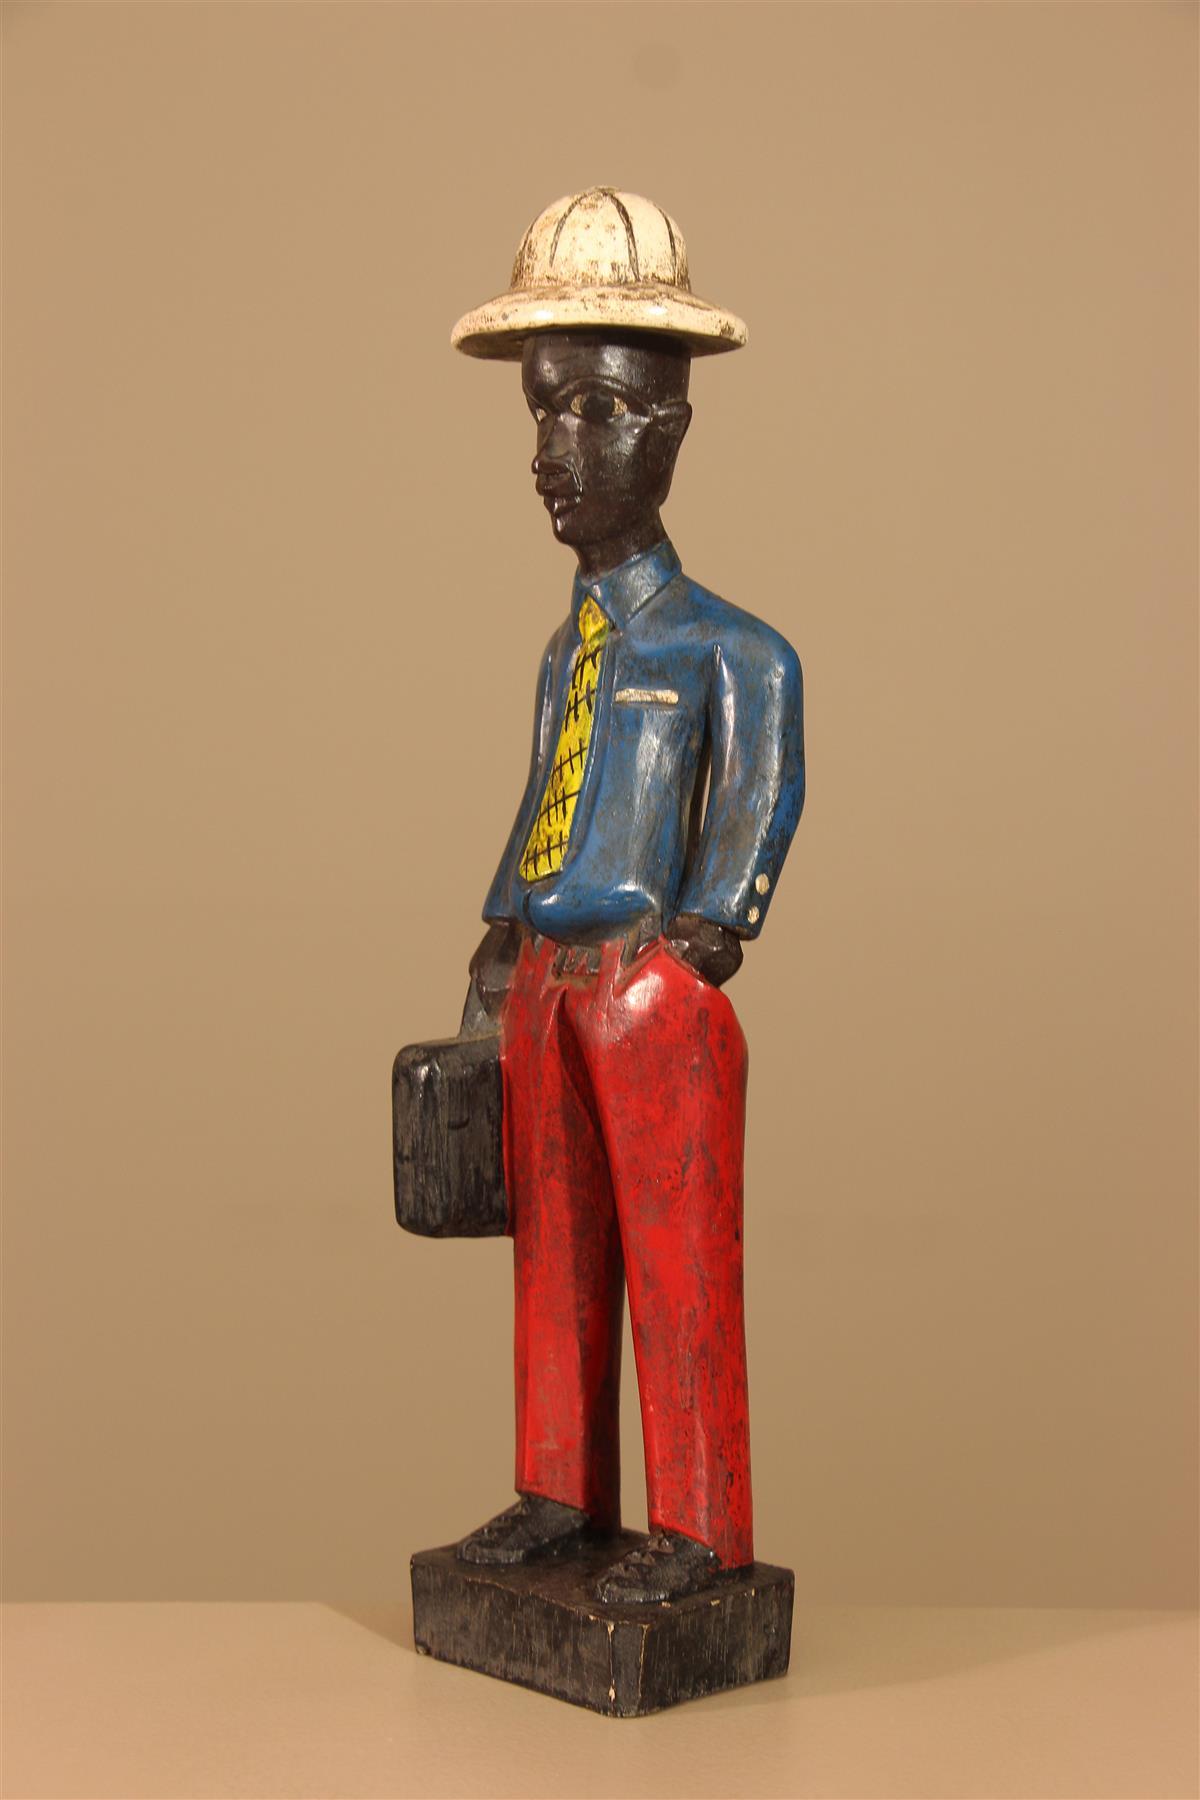 Statuette Baule - Déco africaine - Art africain traditionnel